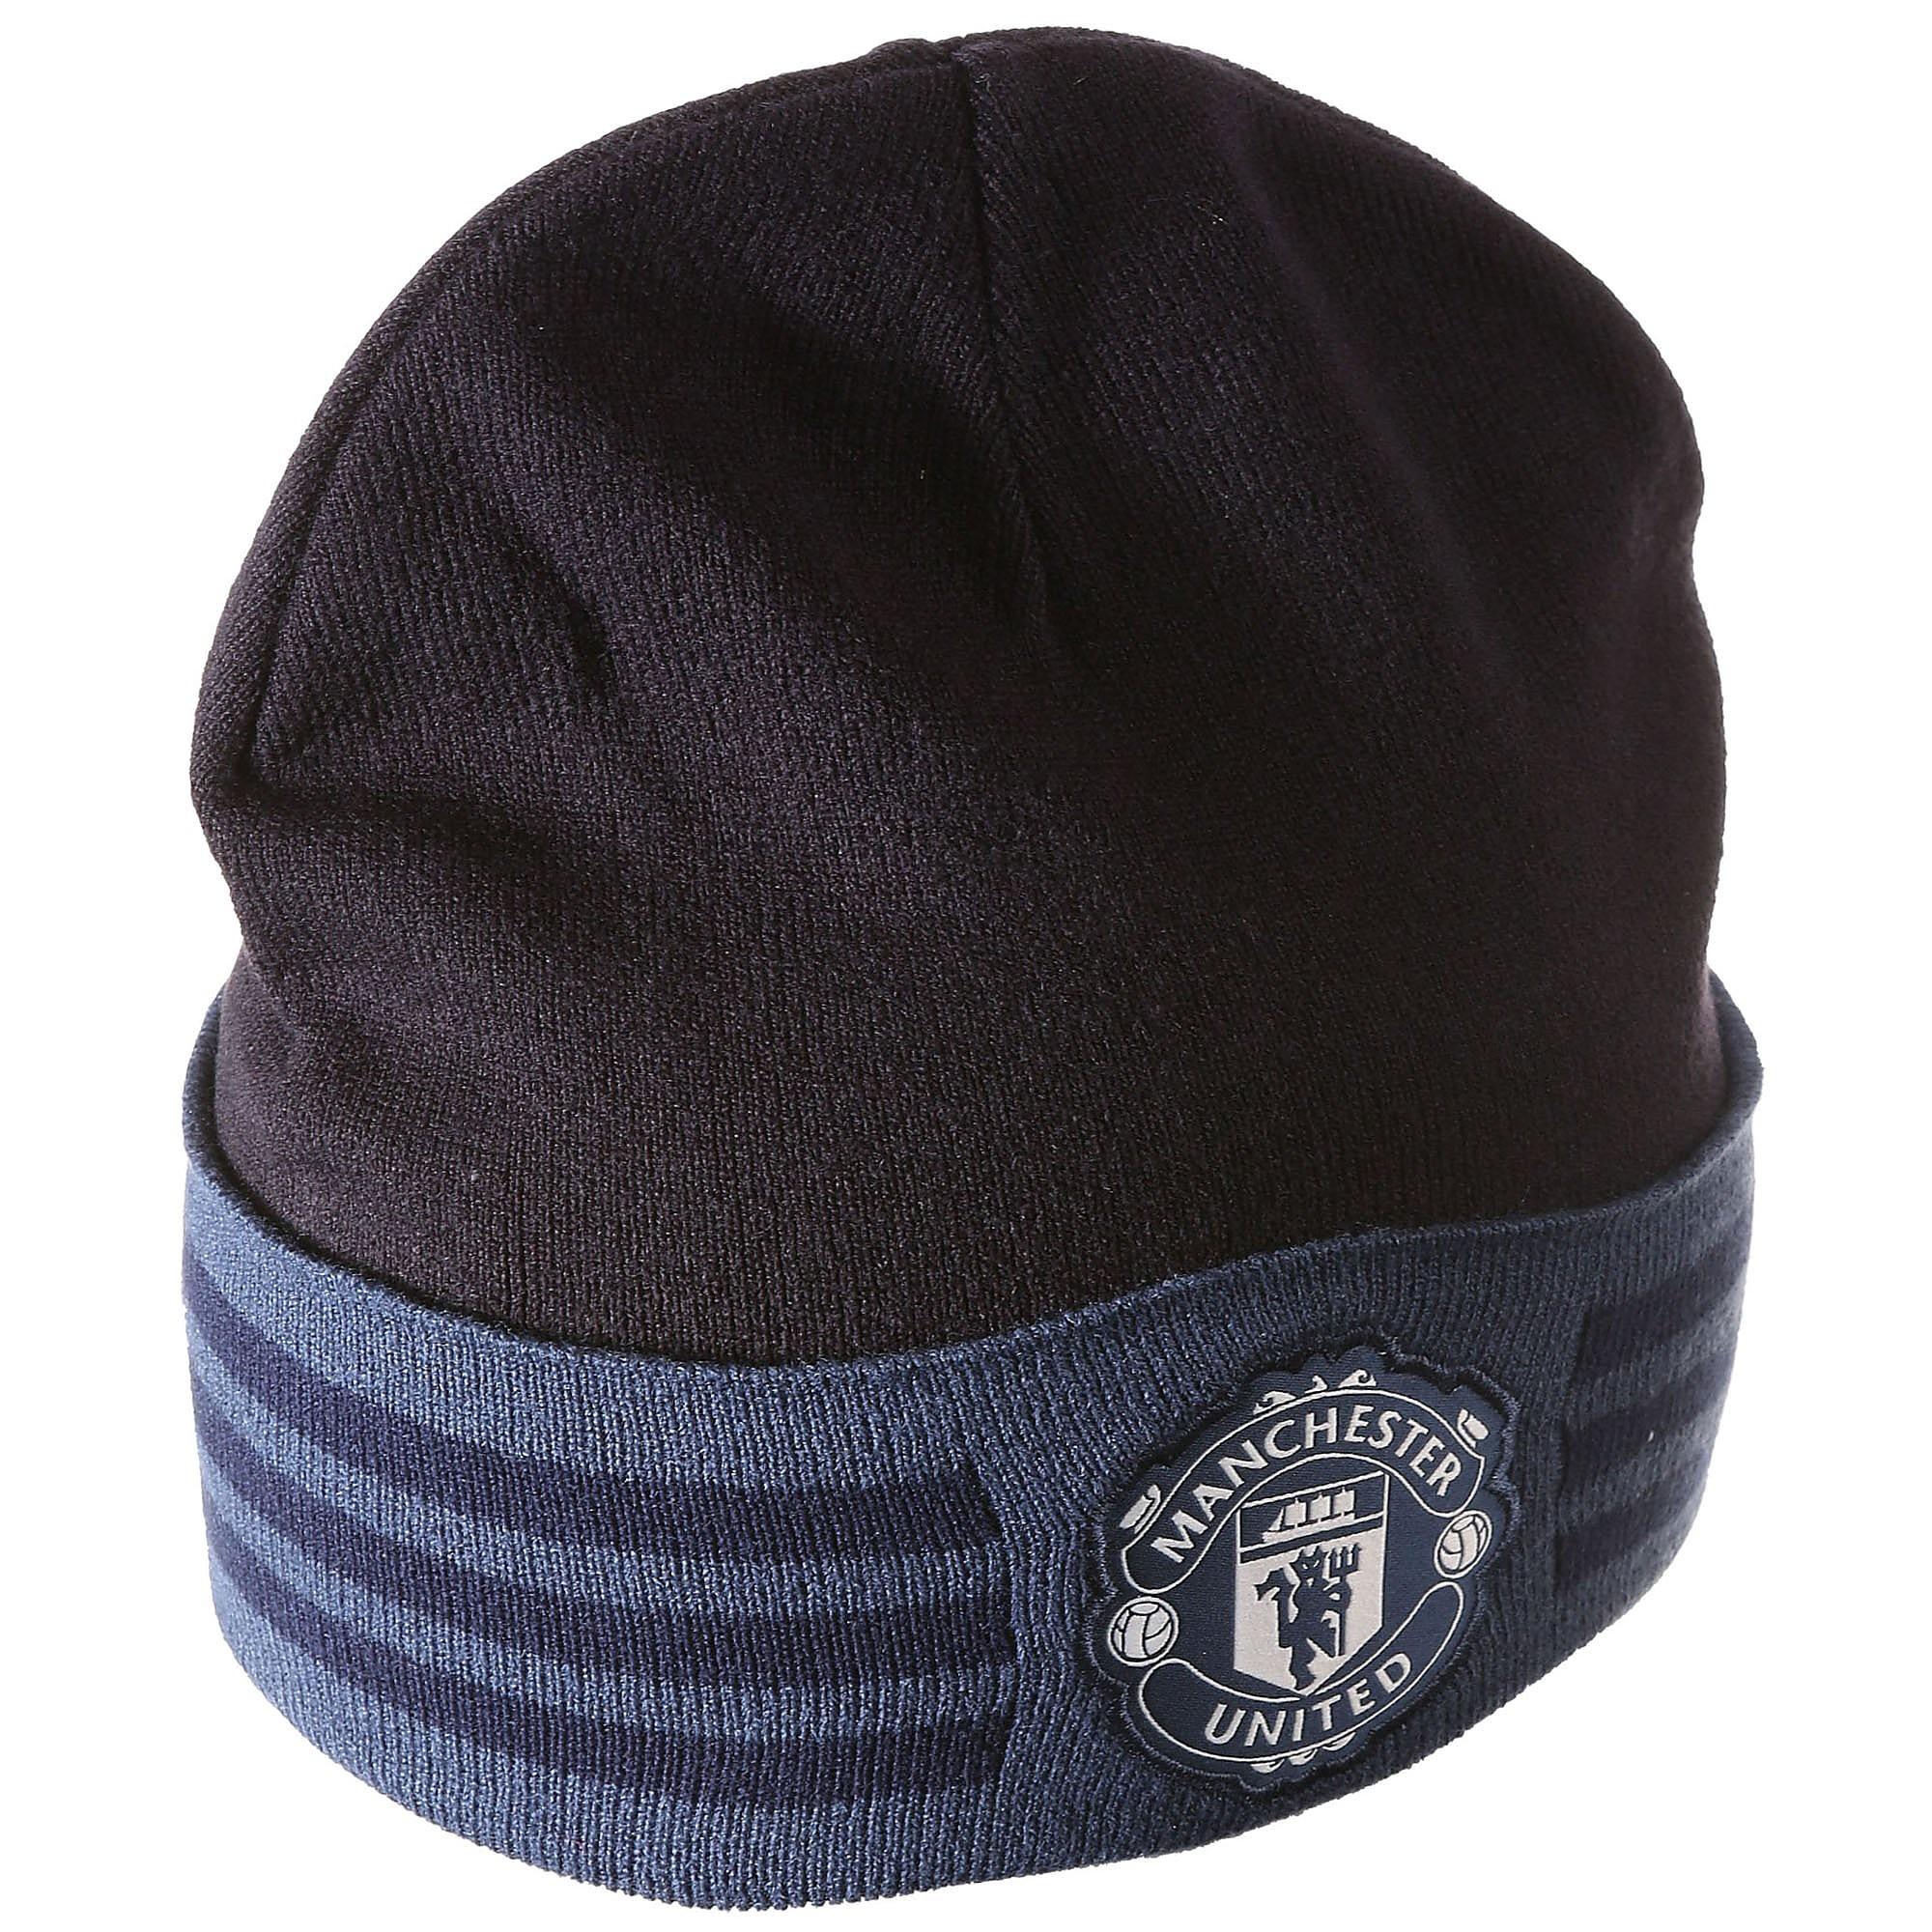 Manchester United Fc 3-Stripe Muts 16/17 Zwart/Blauw Heren